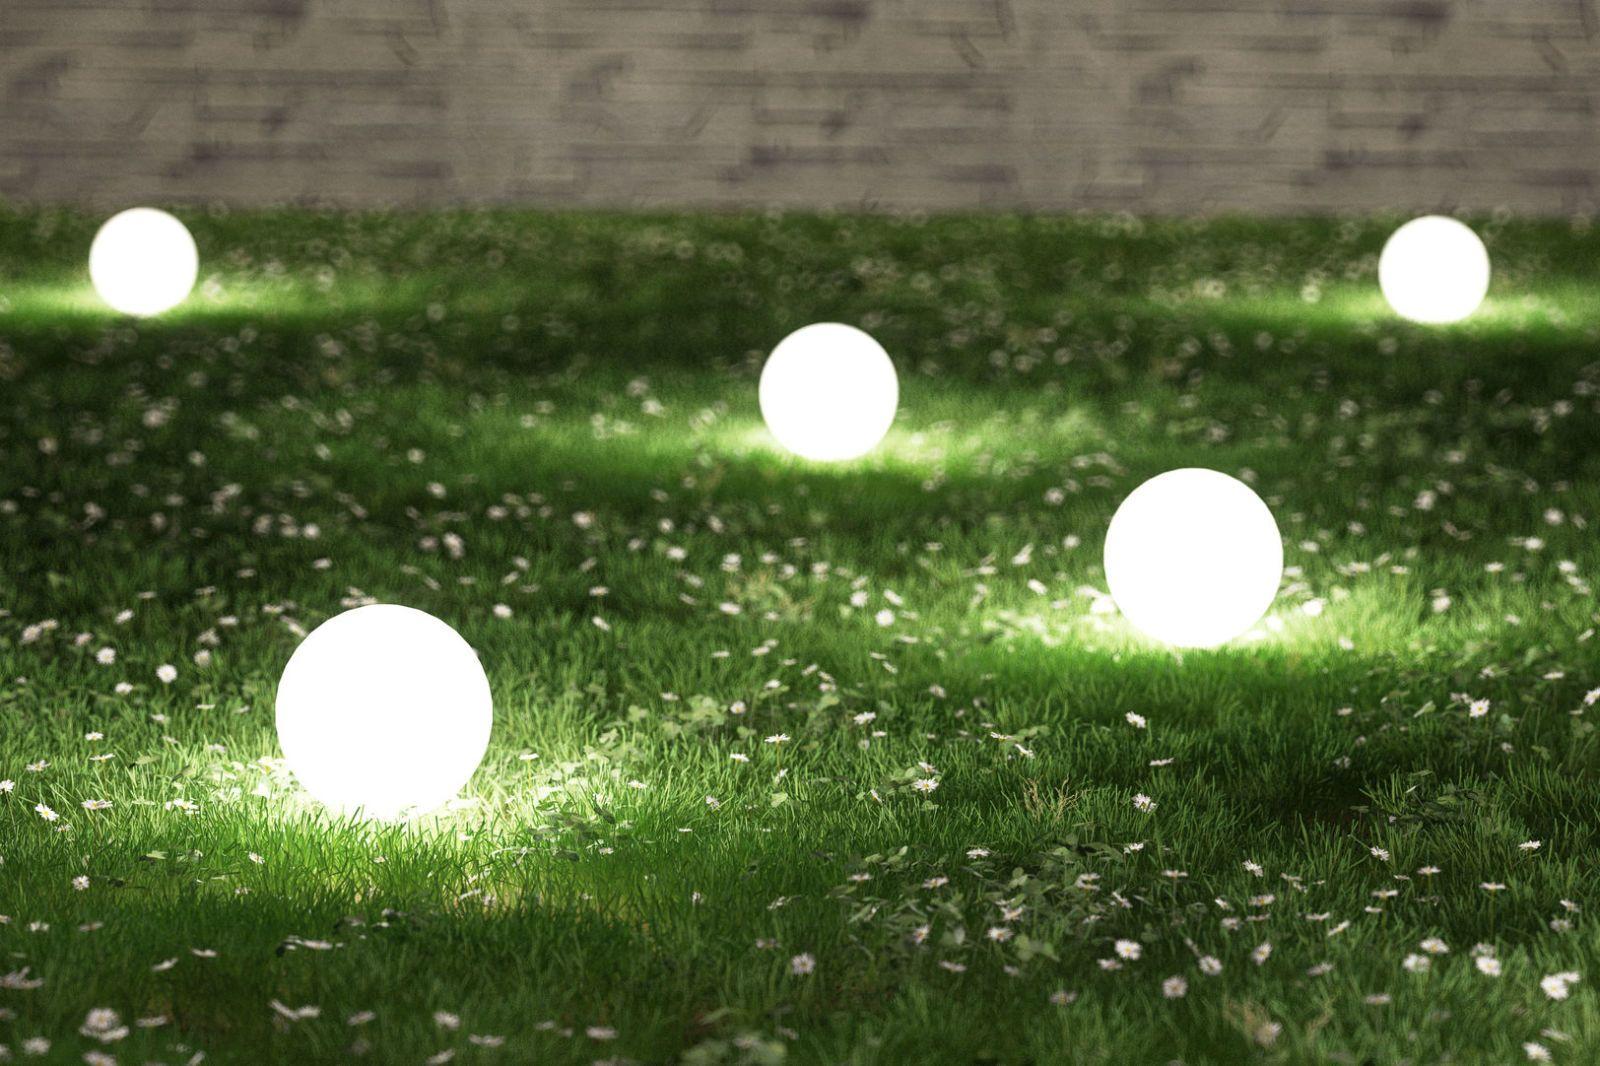 Illuminated Lamps On Grassy Field In Garden